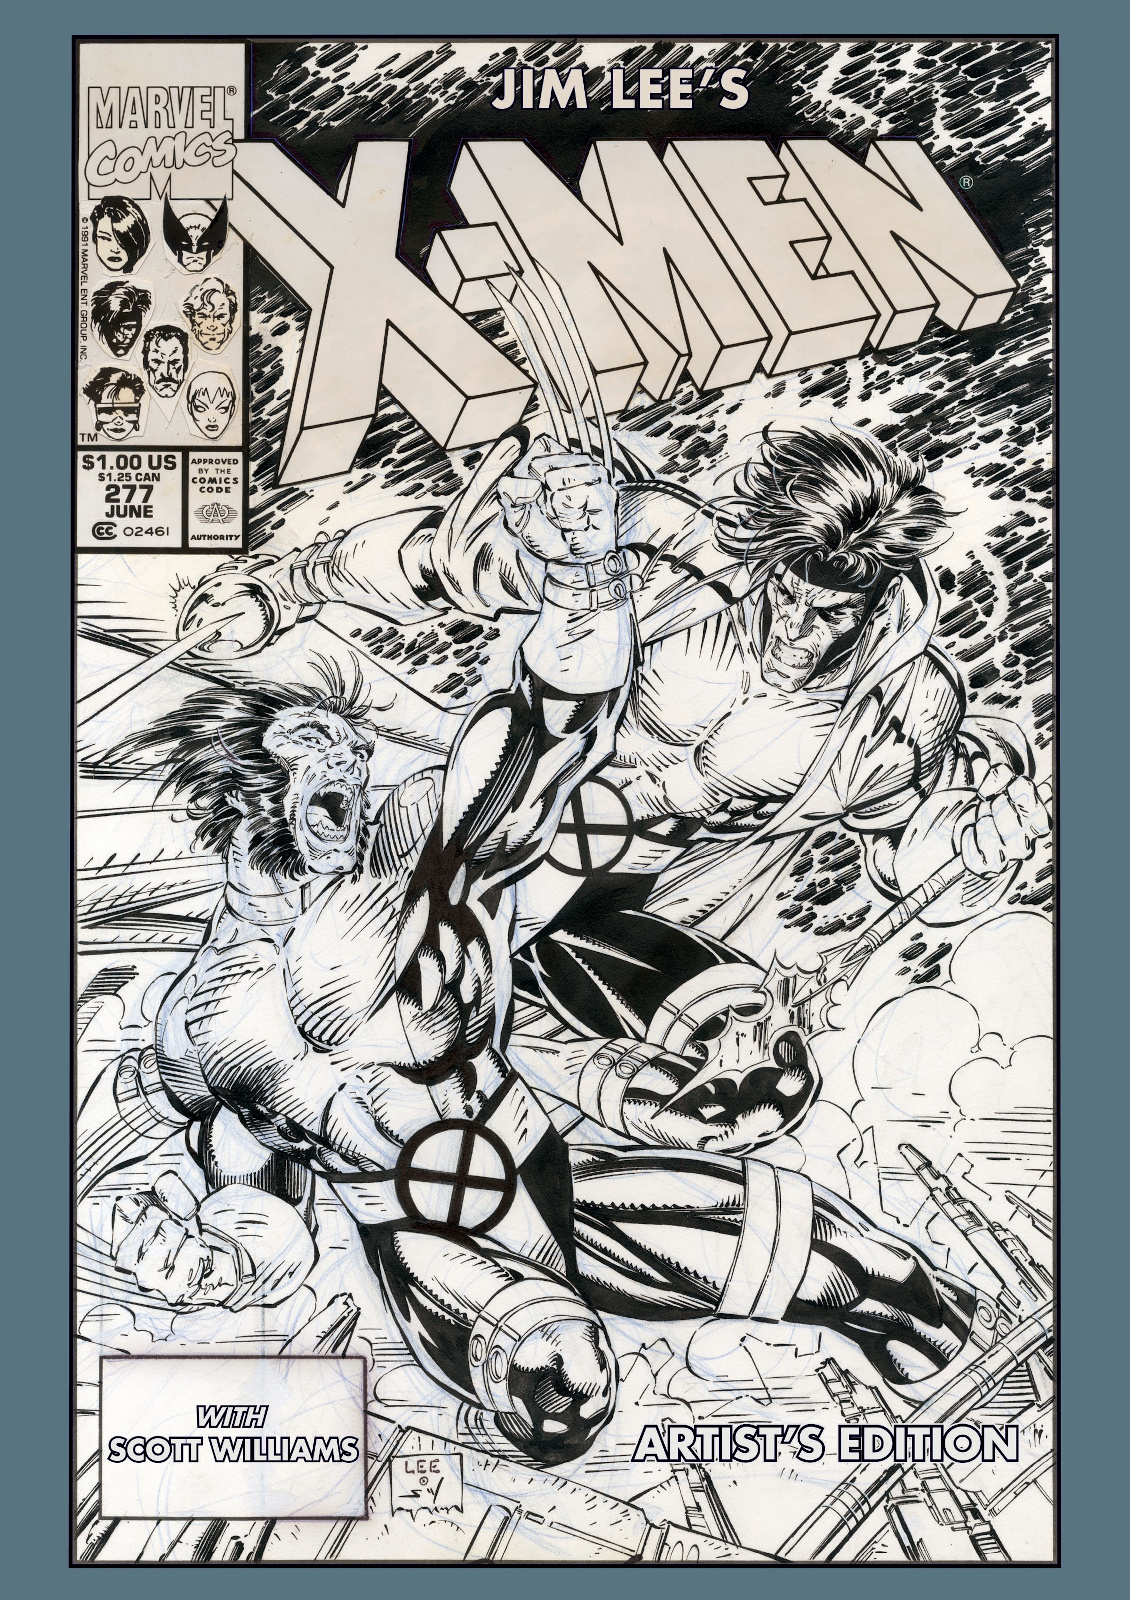 Jim Lees X Men Artists Edition cover prelim